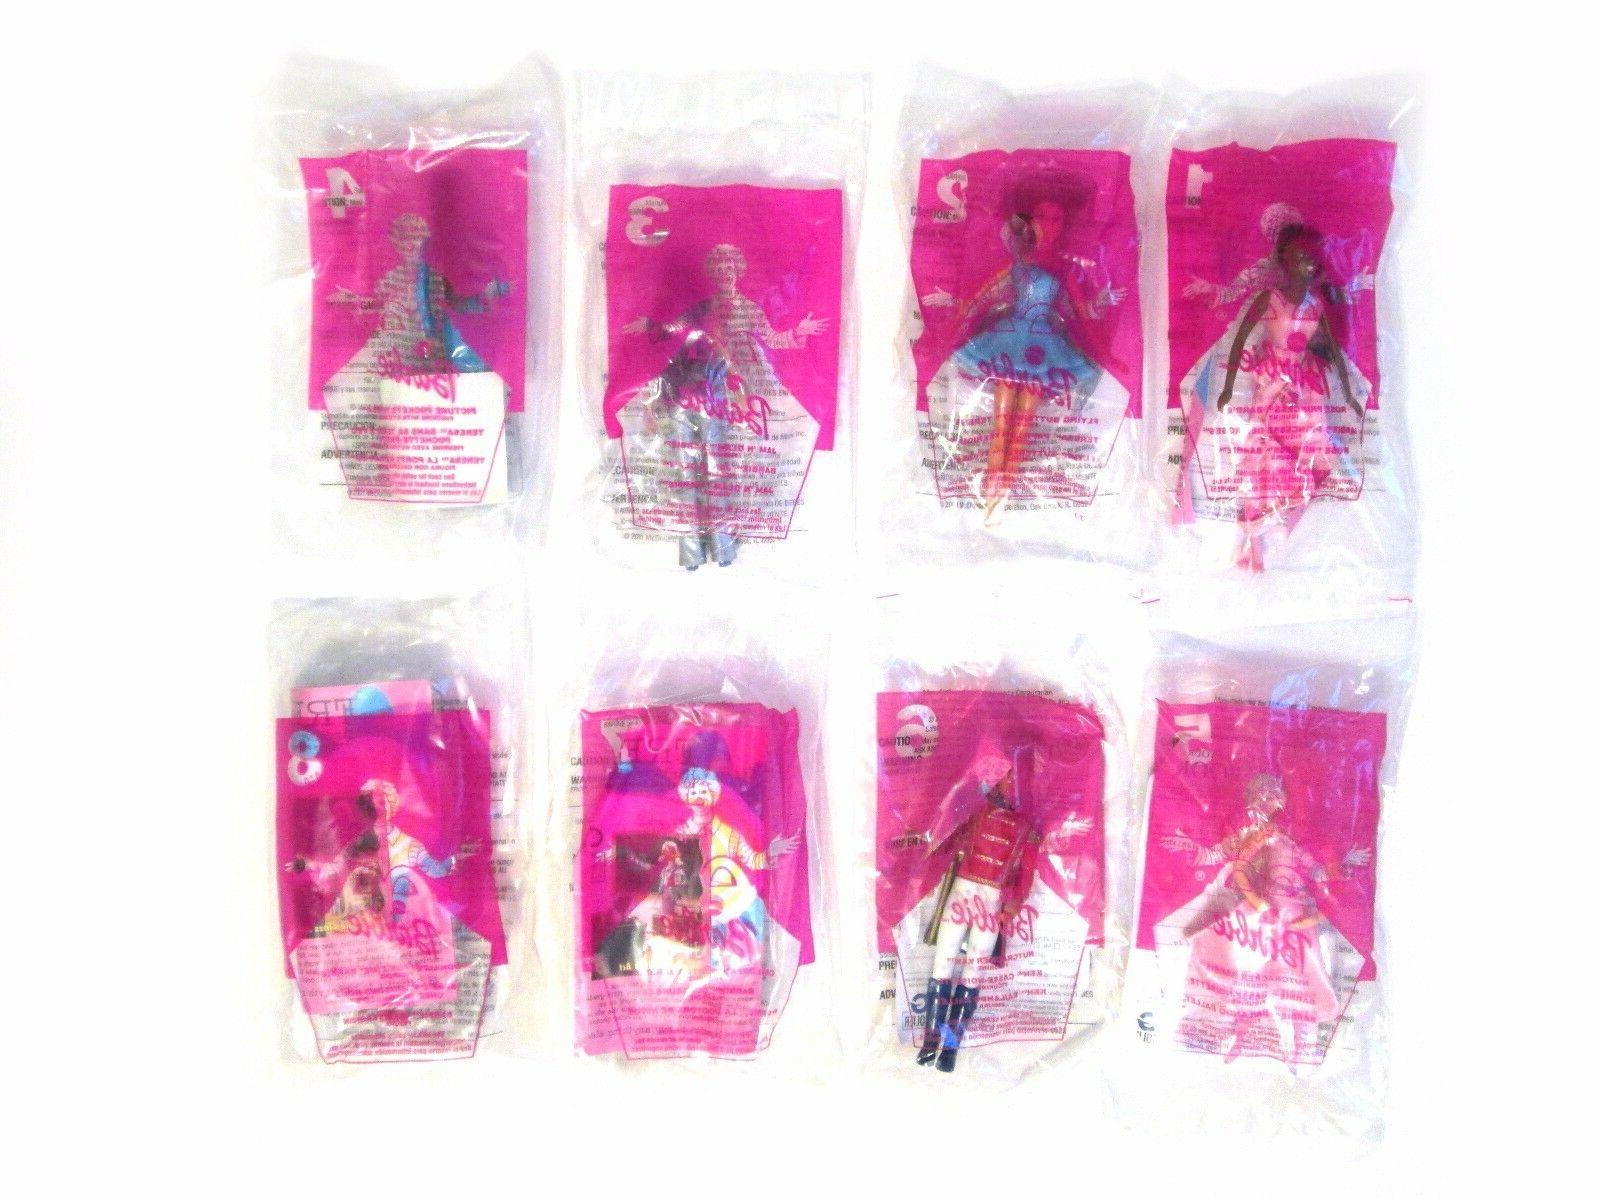 Vintage 2001 McDonald's Barbie Toys - Complete Set of 8 + Du